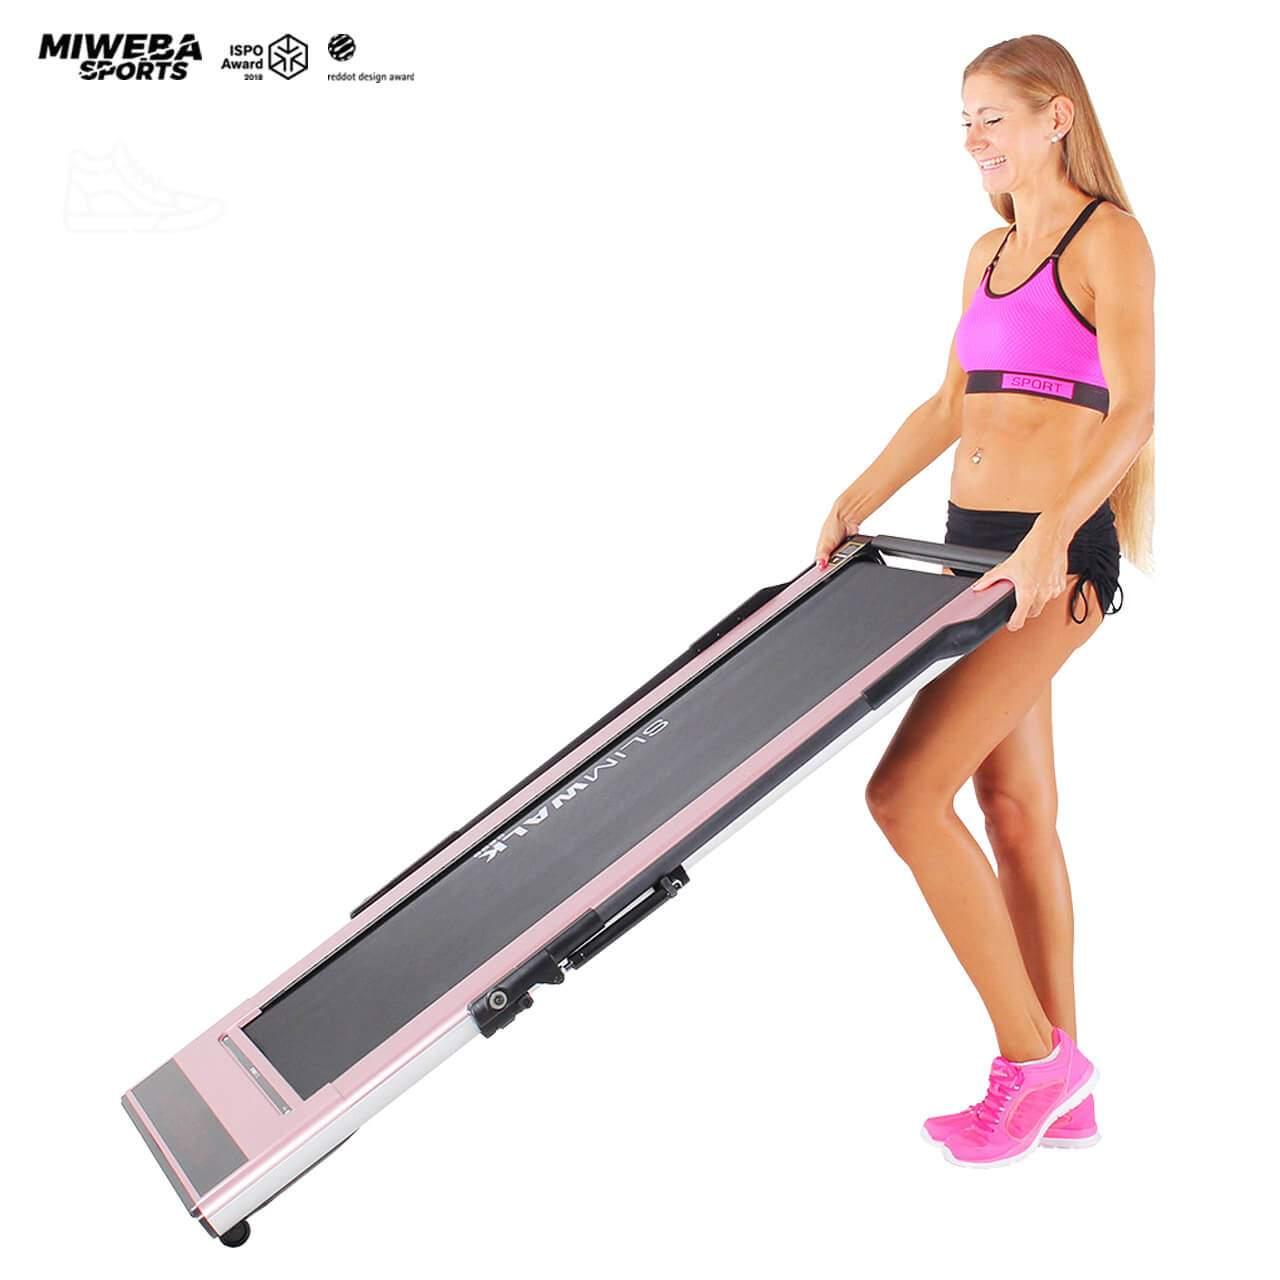 Miweba Sports Laufband SlimWalk S200